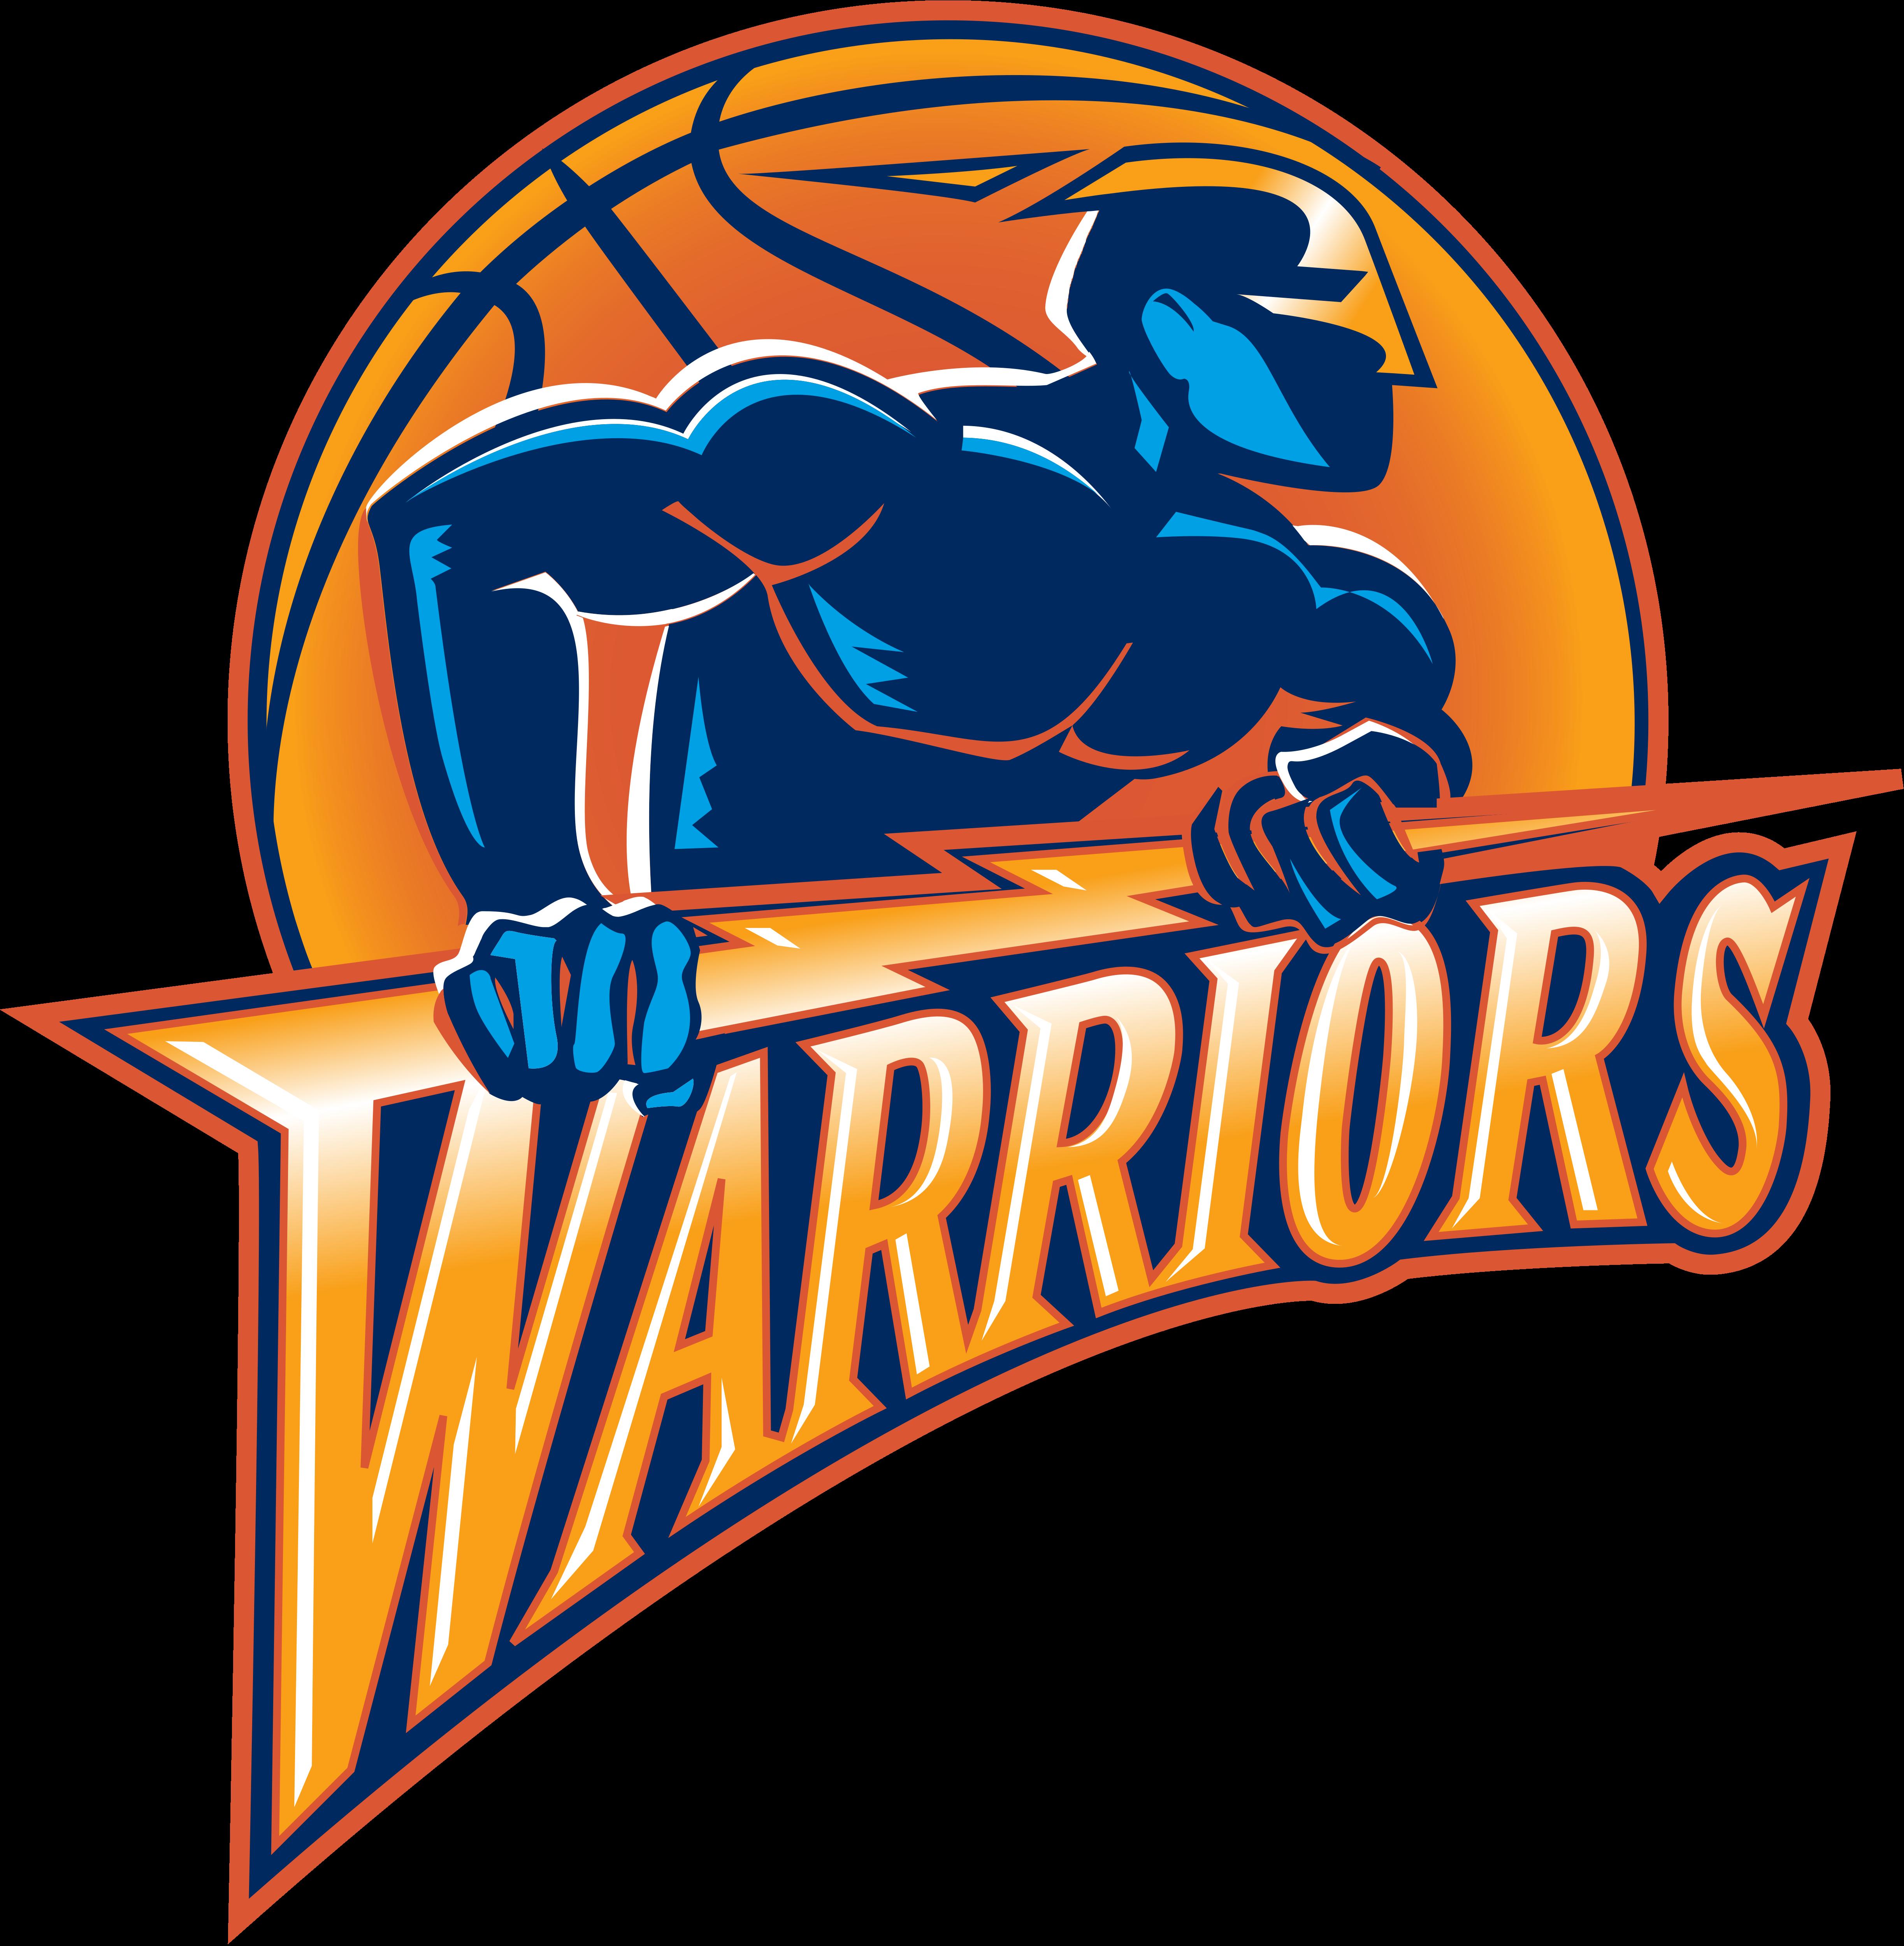 Golden State Warriors: Golden State Warriors